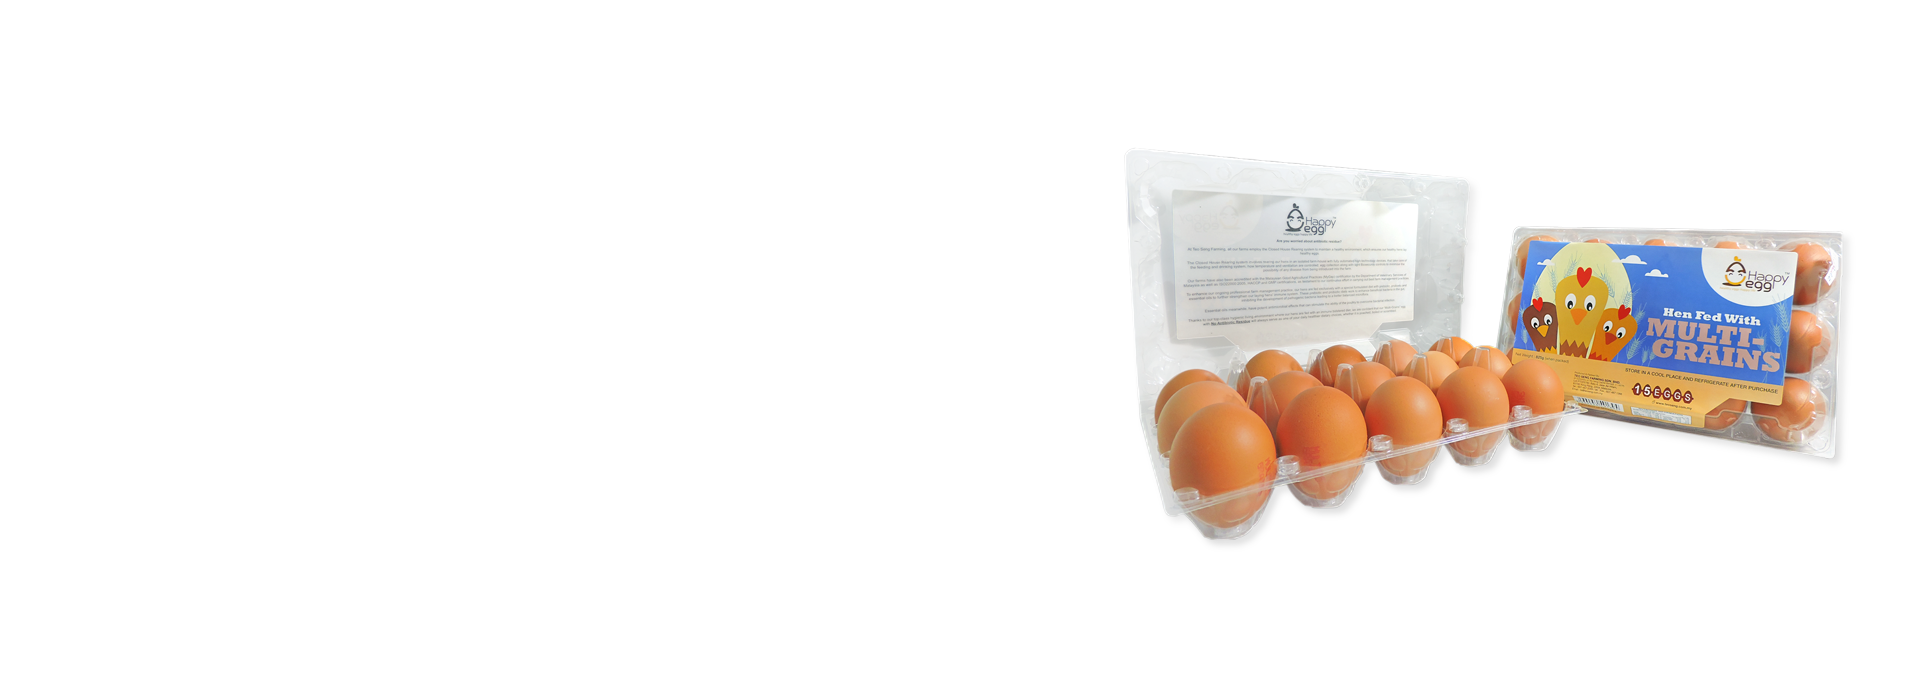 Teo Seng Capital Berhad | Layer Farming, Feed, Egg Tray, Egg